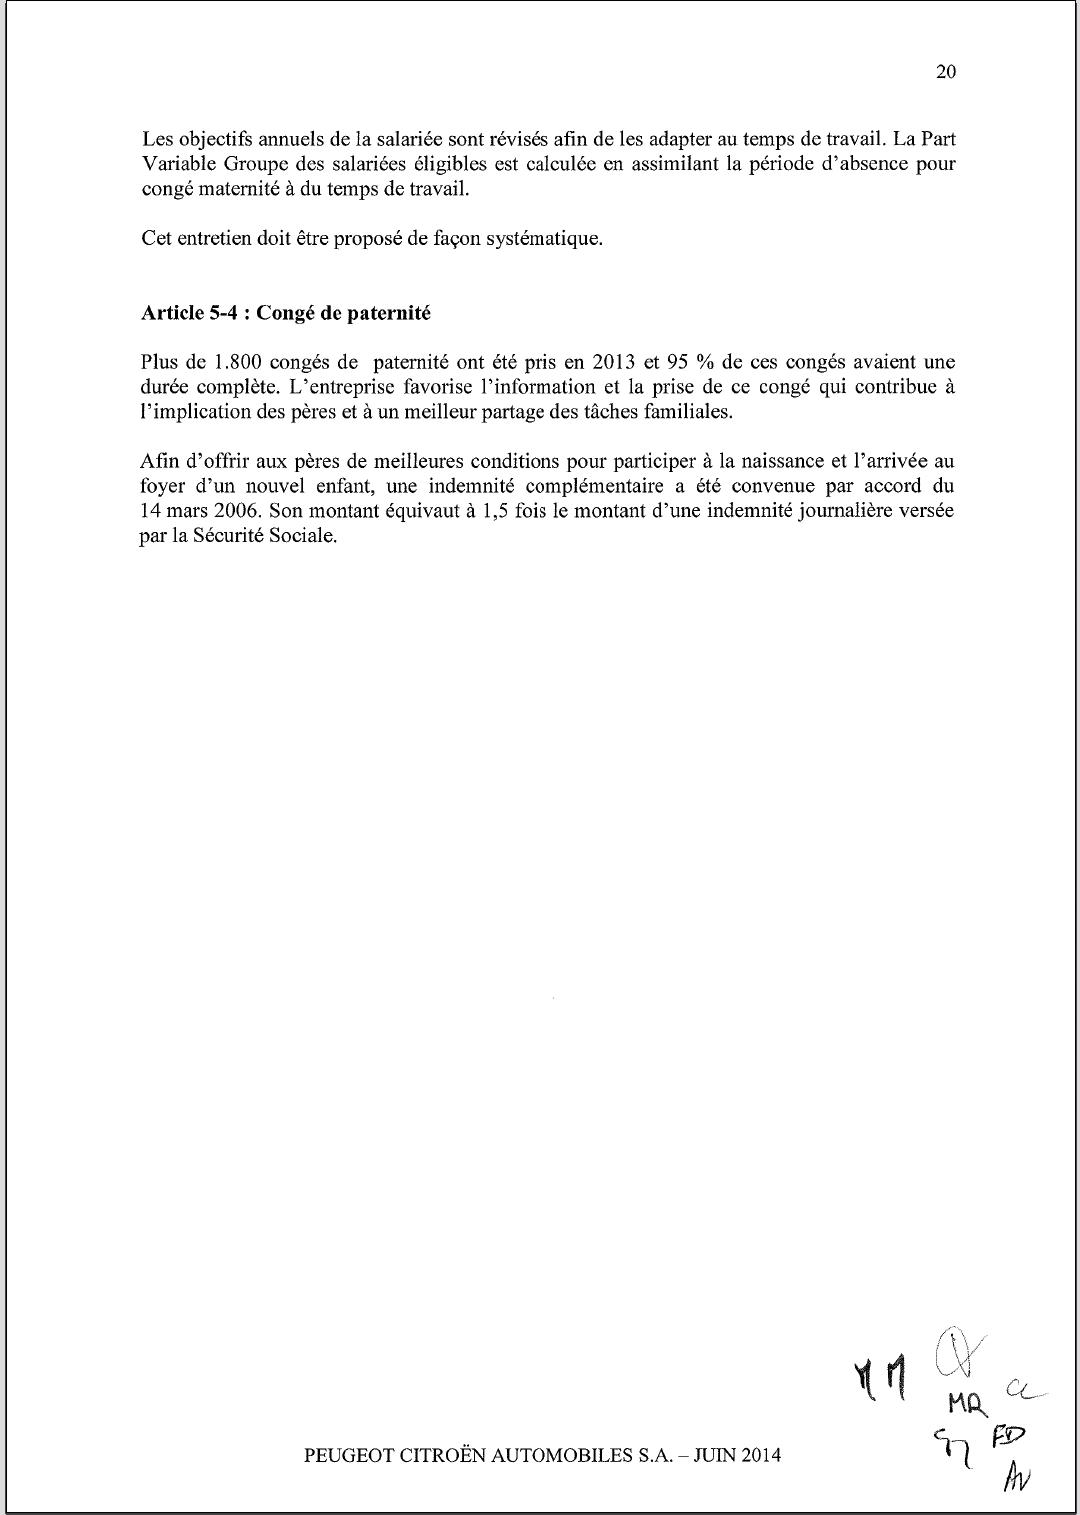 Accord20